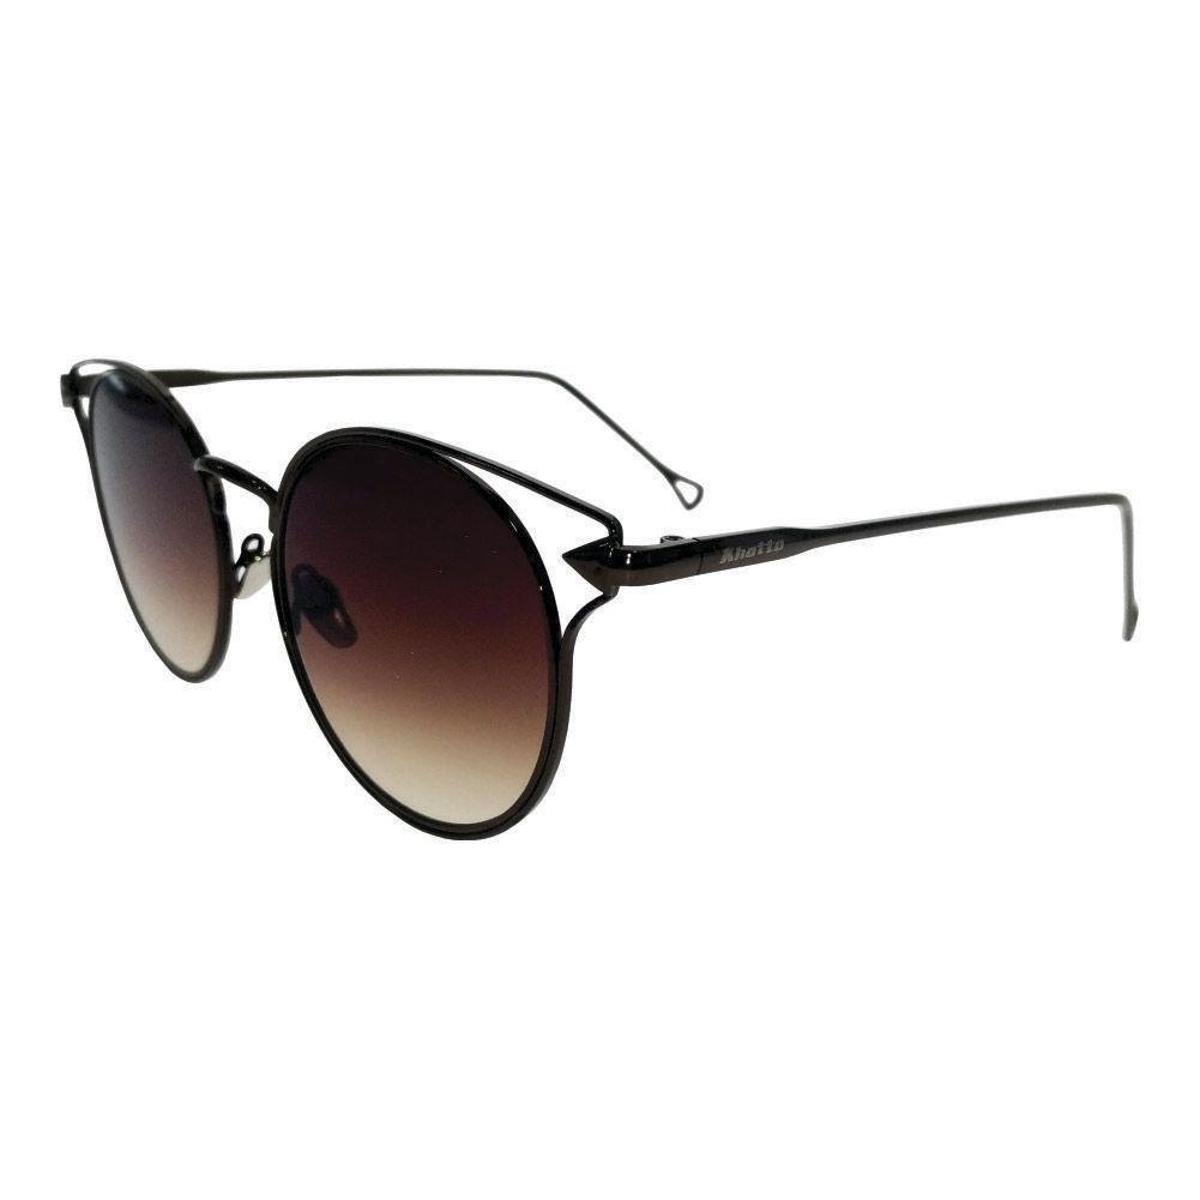 b1b9c49fe3c91 Óculos de Sol Khatto Cat Cool Feminino - Marrom - Compre Agora   Zattini